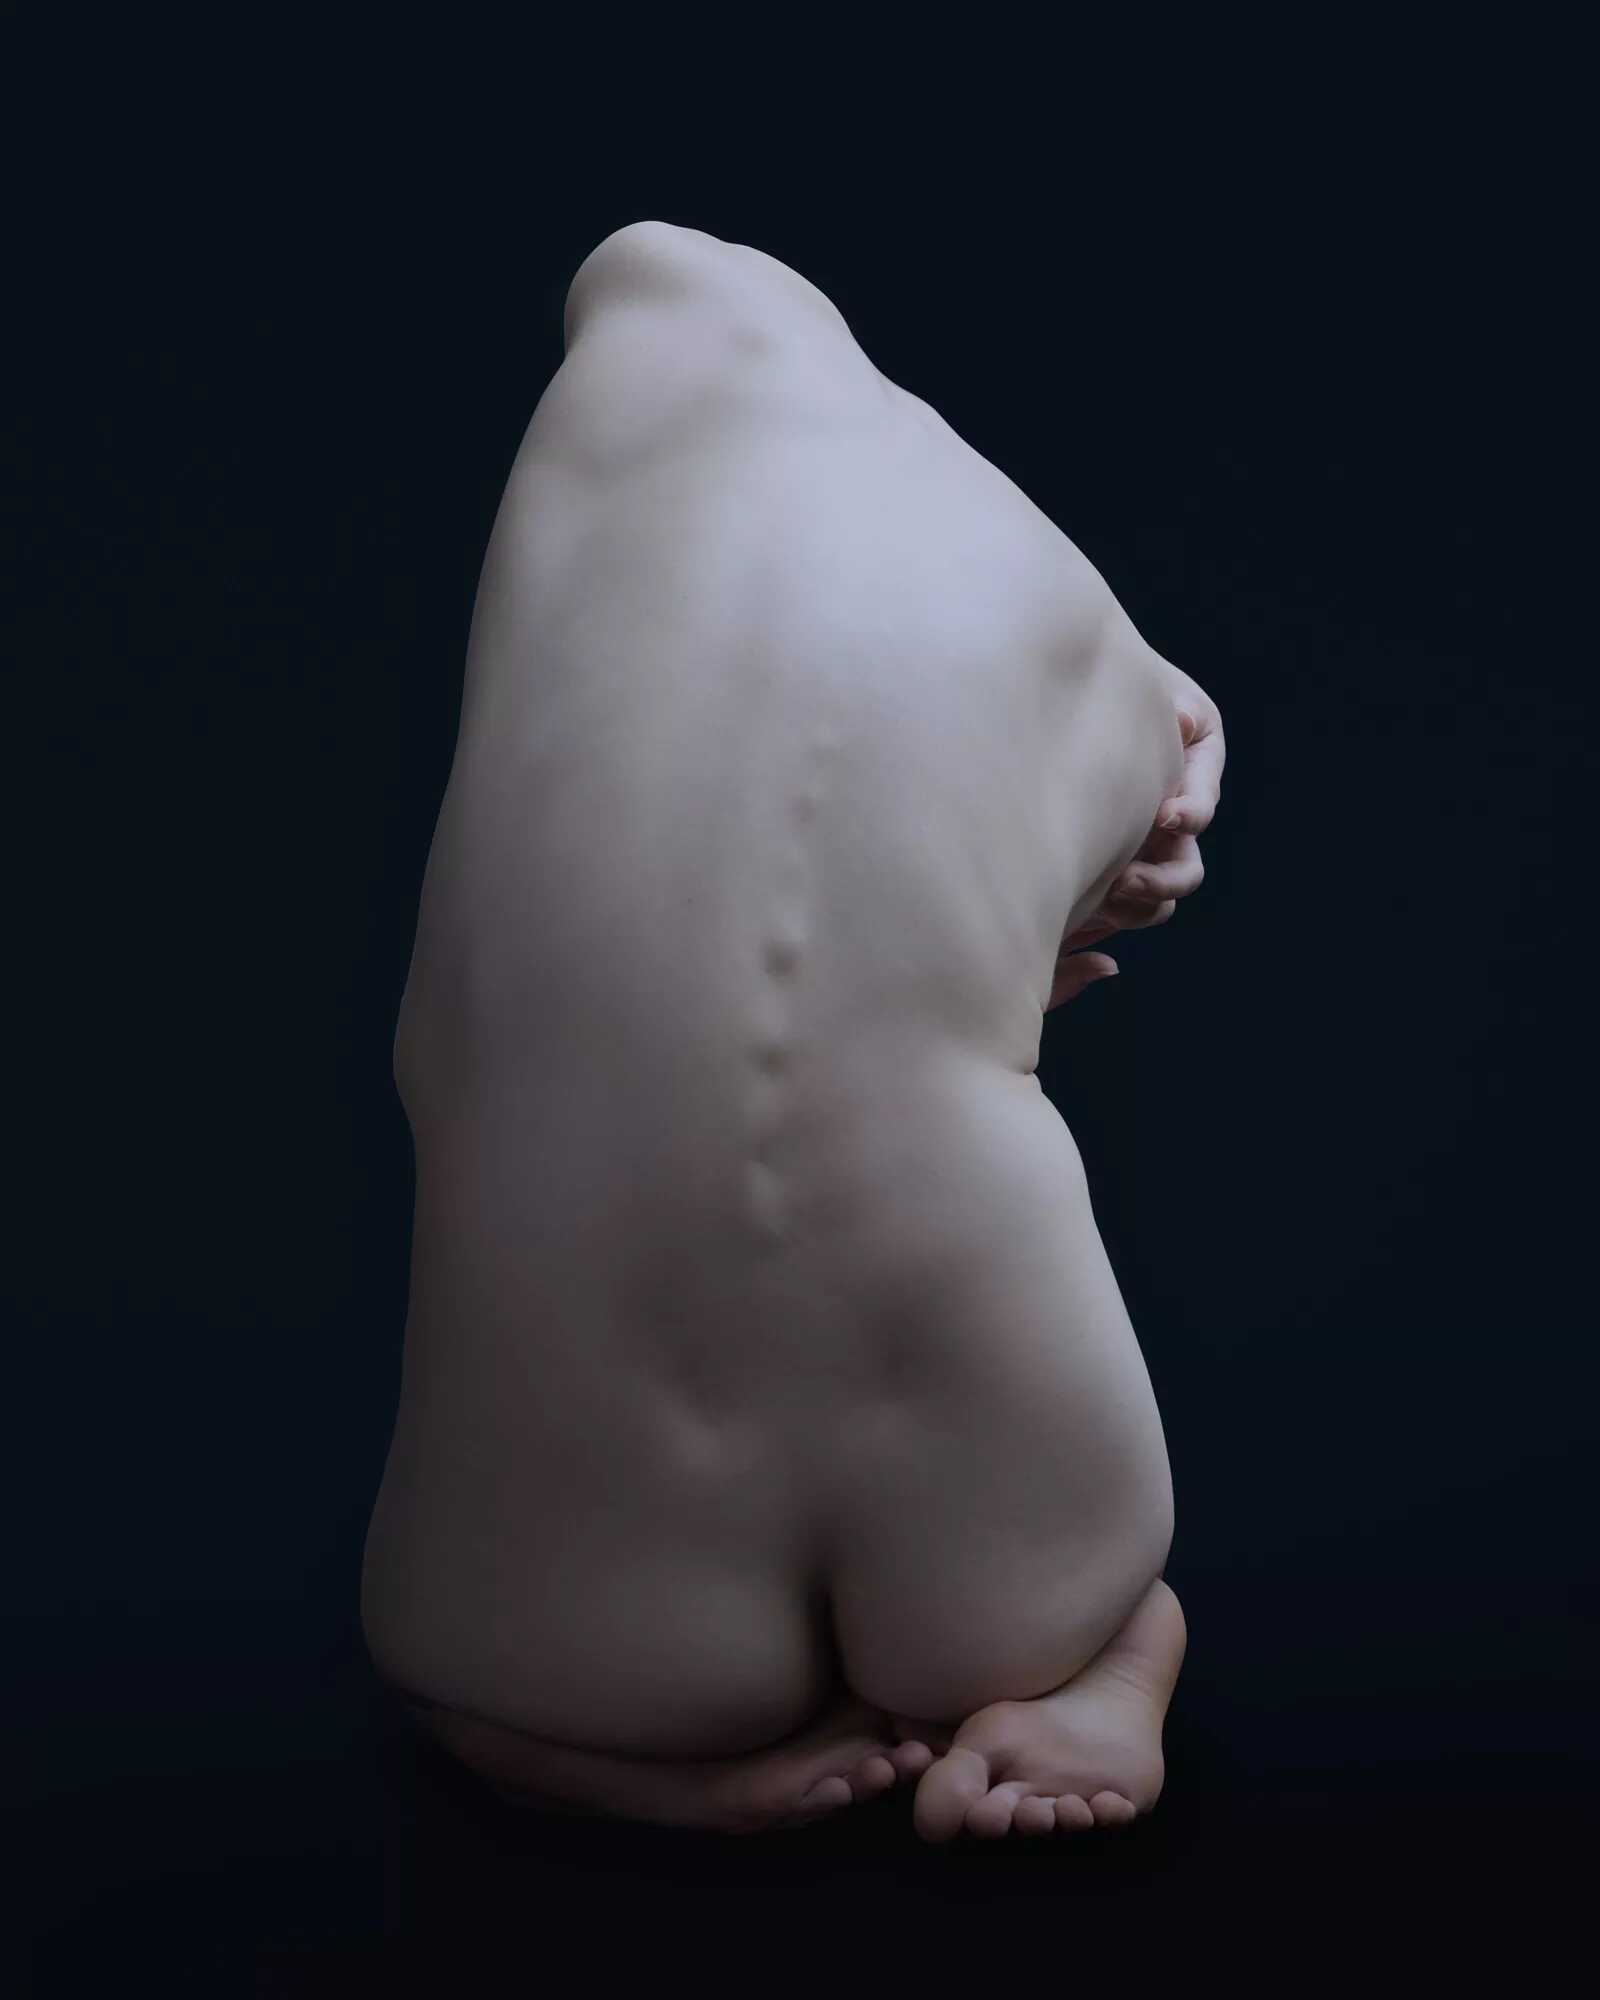 Richard-Westerhuis-NUDE-ABSTRACT-Anastasia.jpg